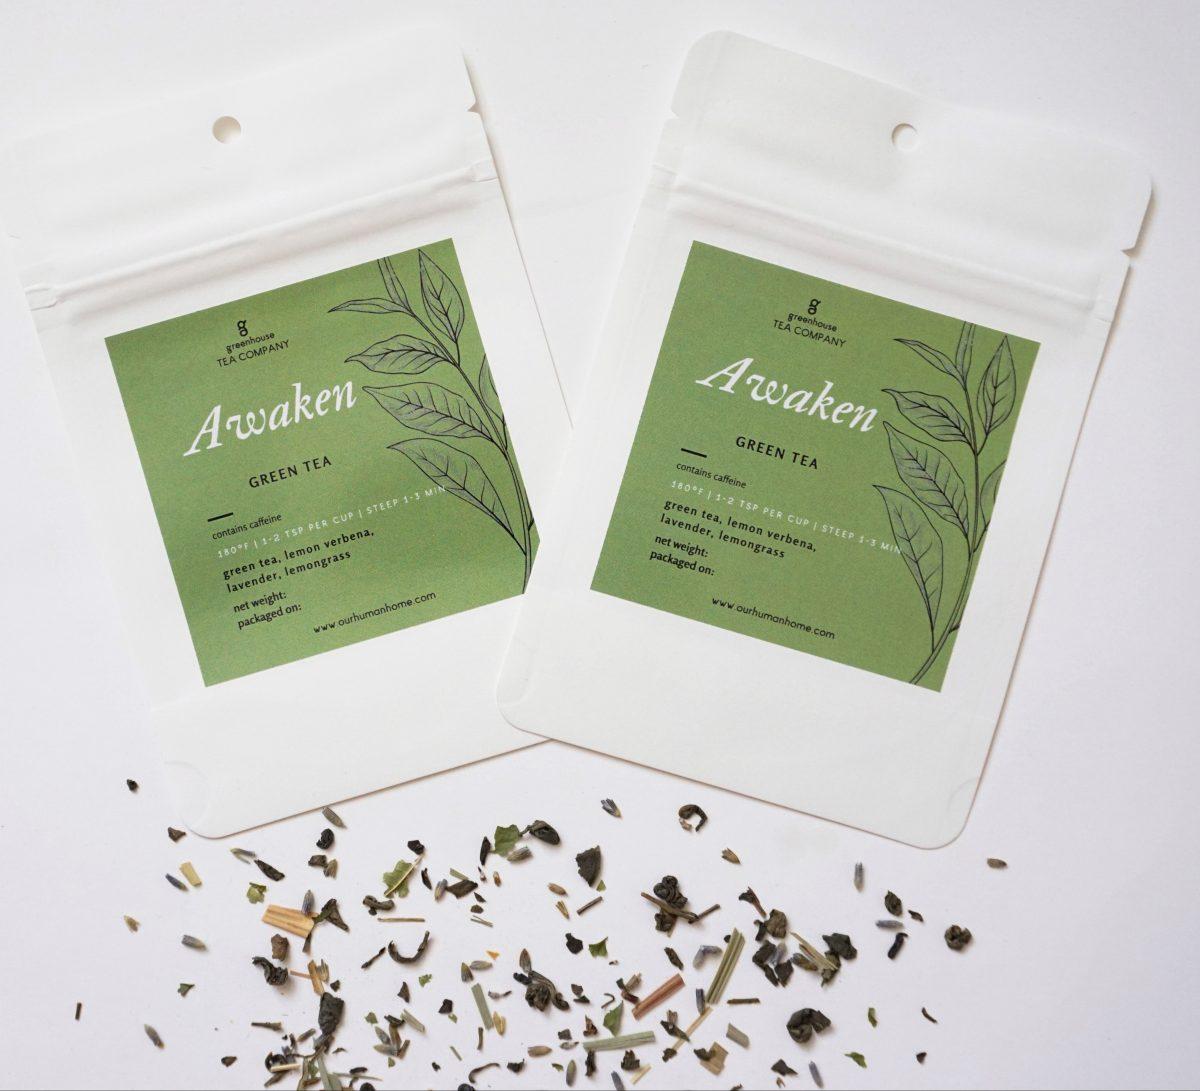 Awaken green tea by Greenhouse Tea Company